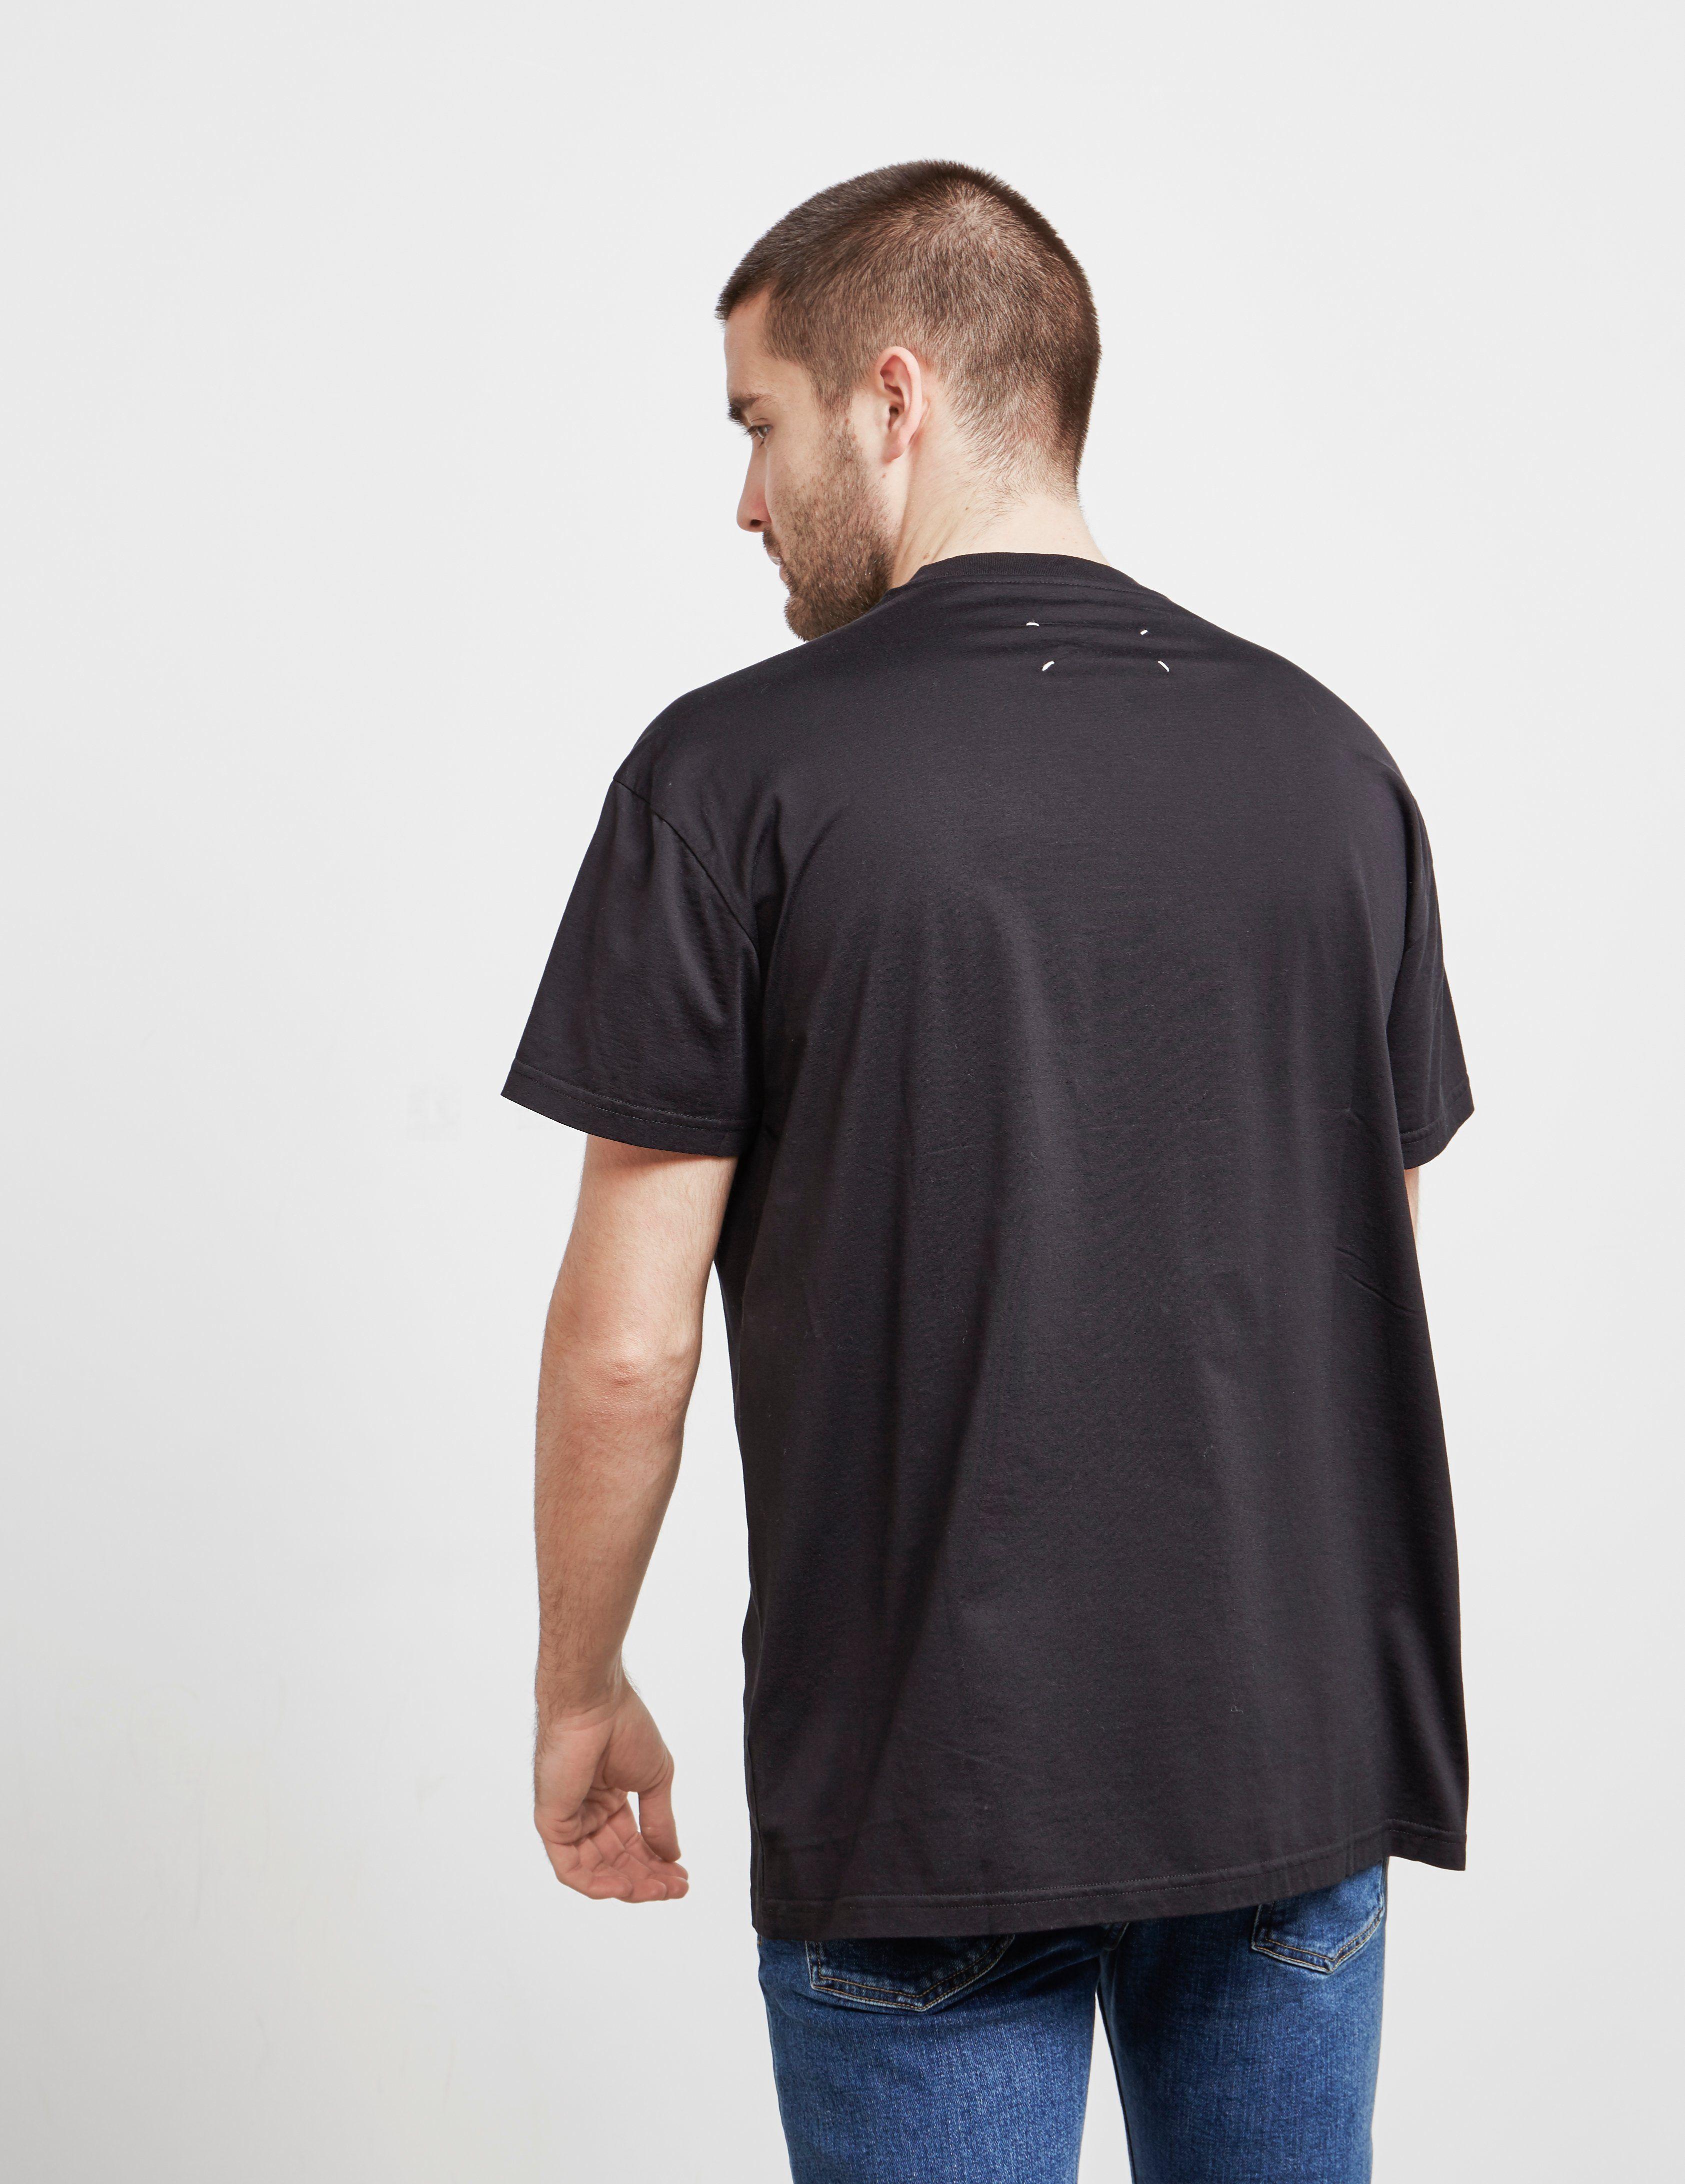 Maison Margiela Touch Short Sleeve T-Shirt